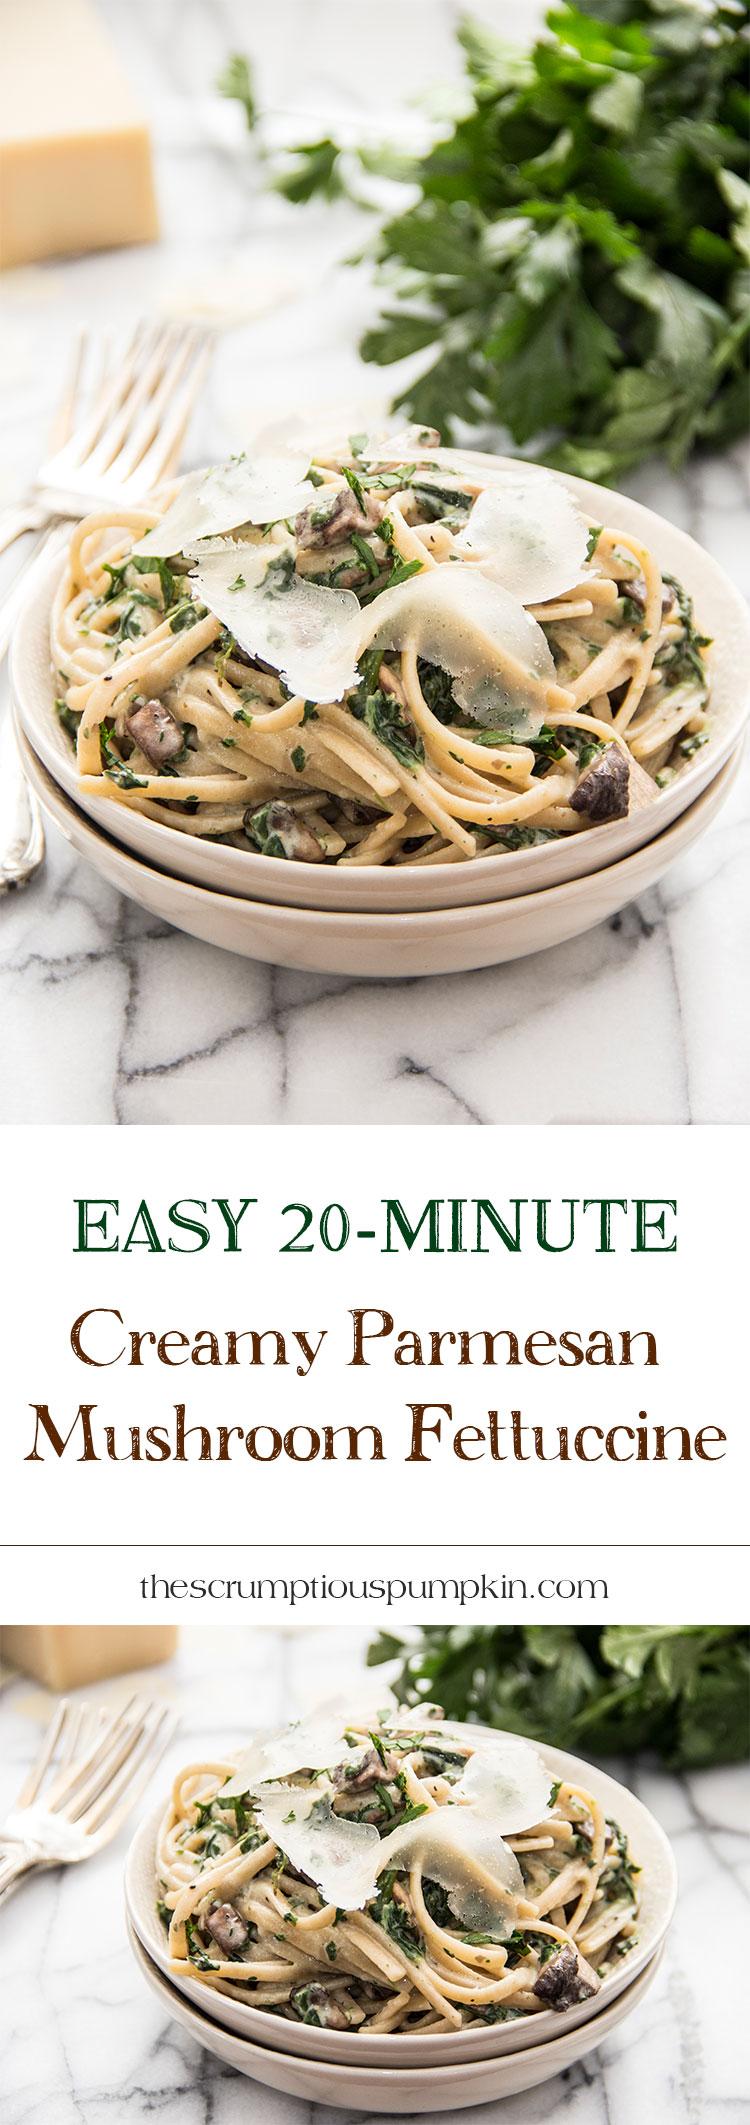 Easy-20-Minute-Creamy-Parmesan-Mushroom-Fettuccine